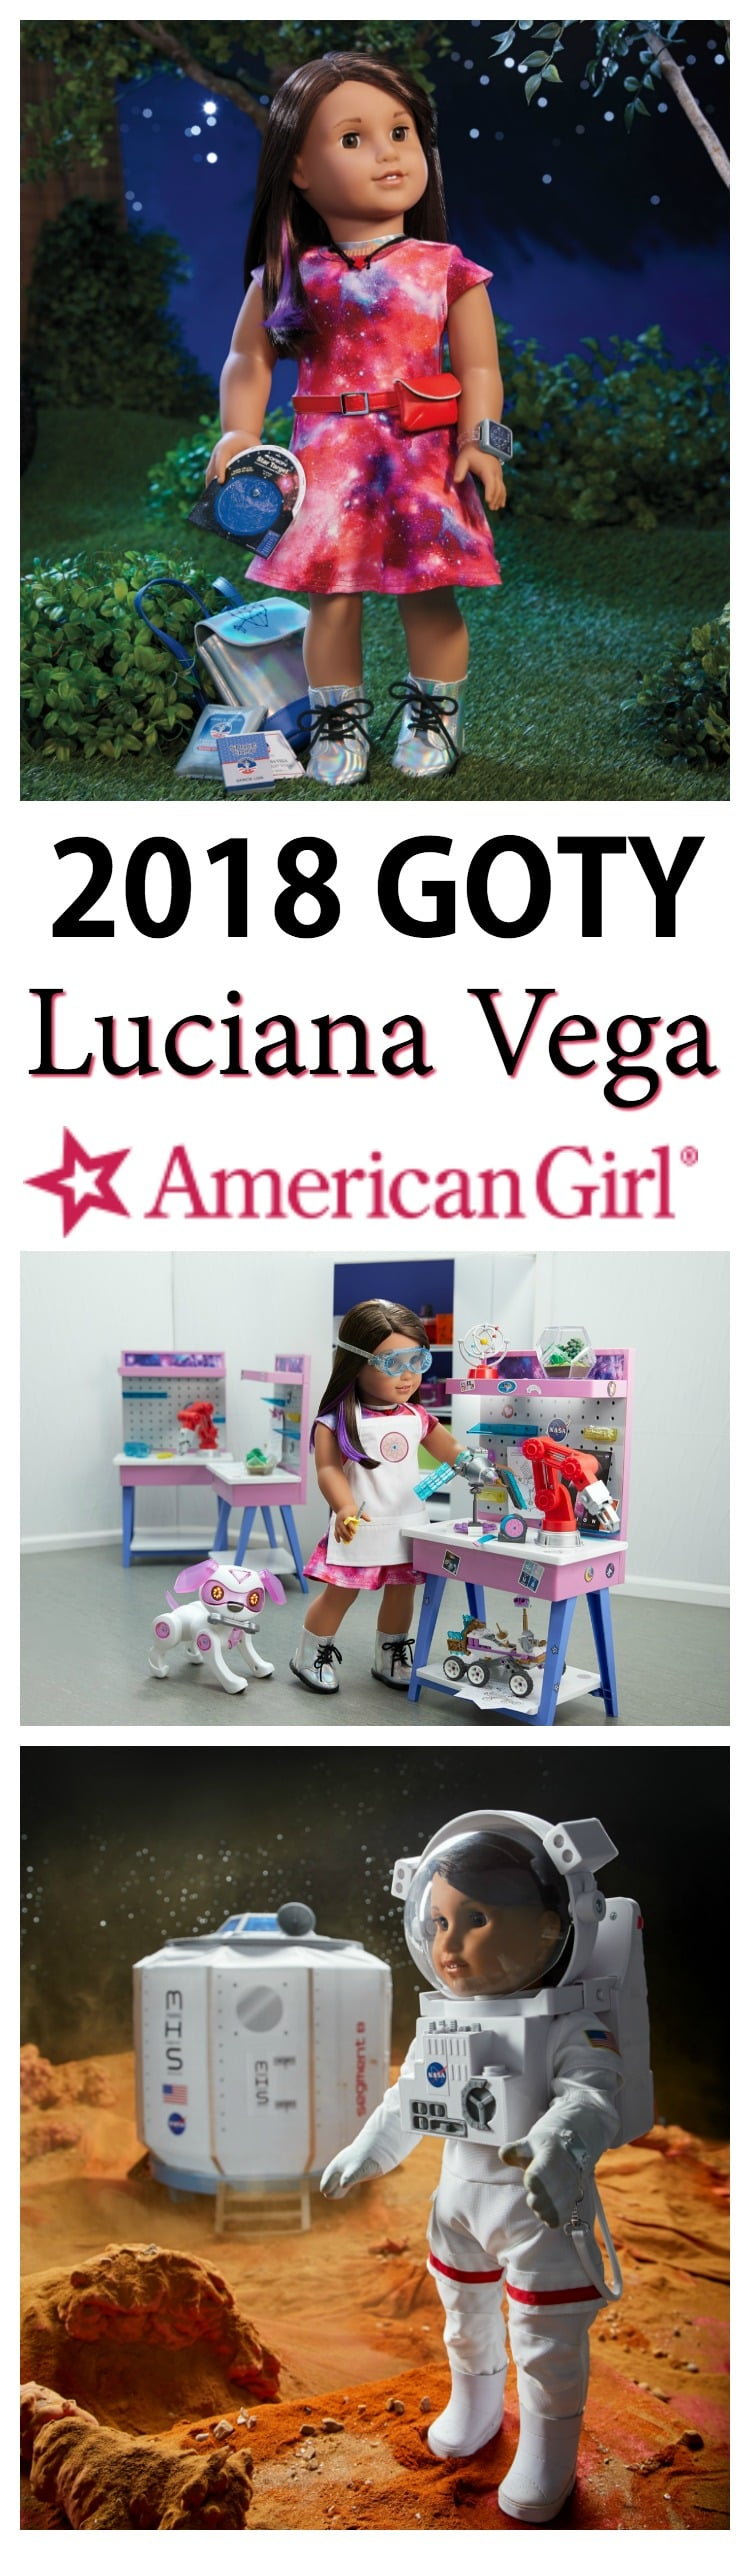 Meet 2018 GOTY American Girl Luciana Vega